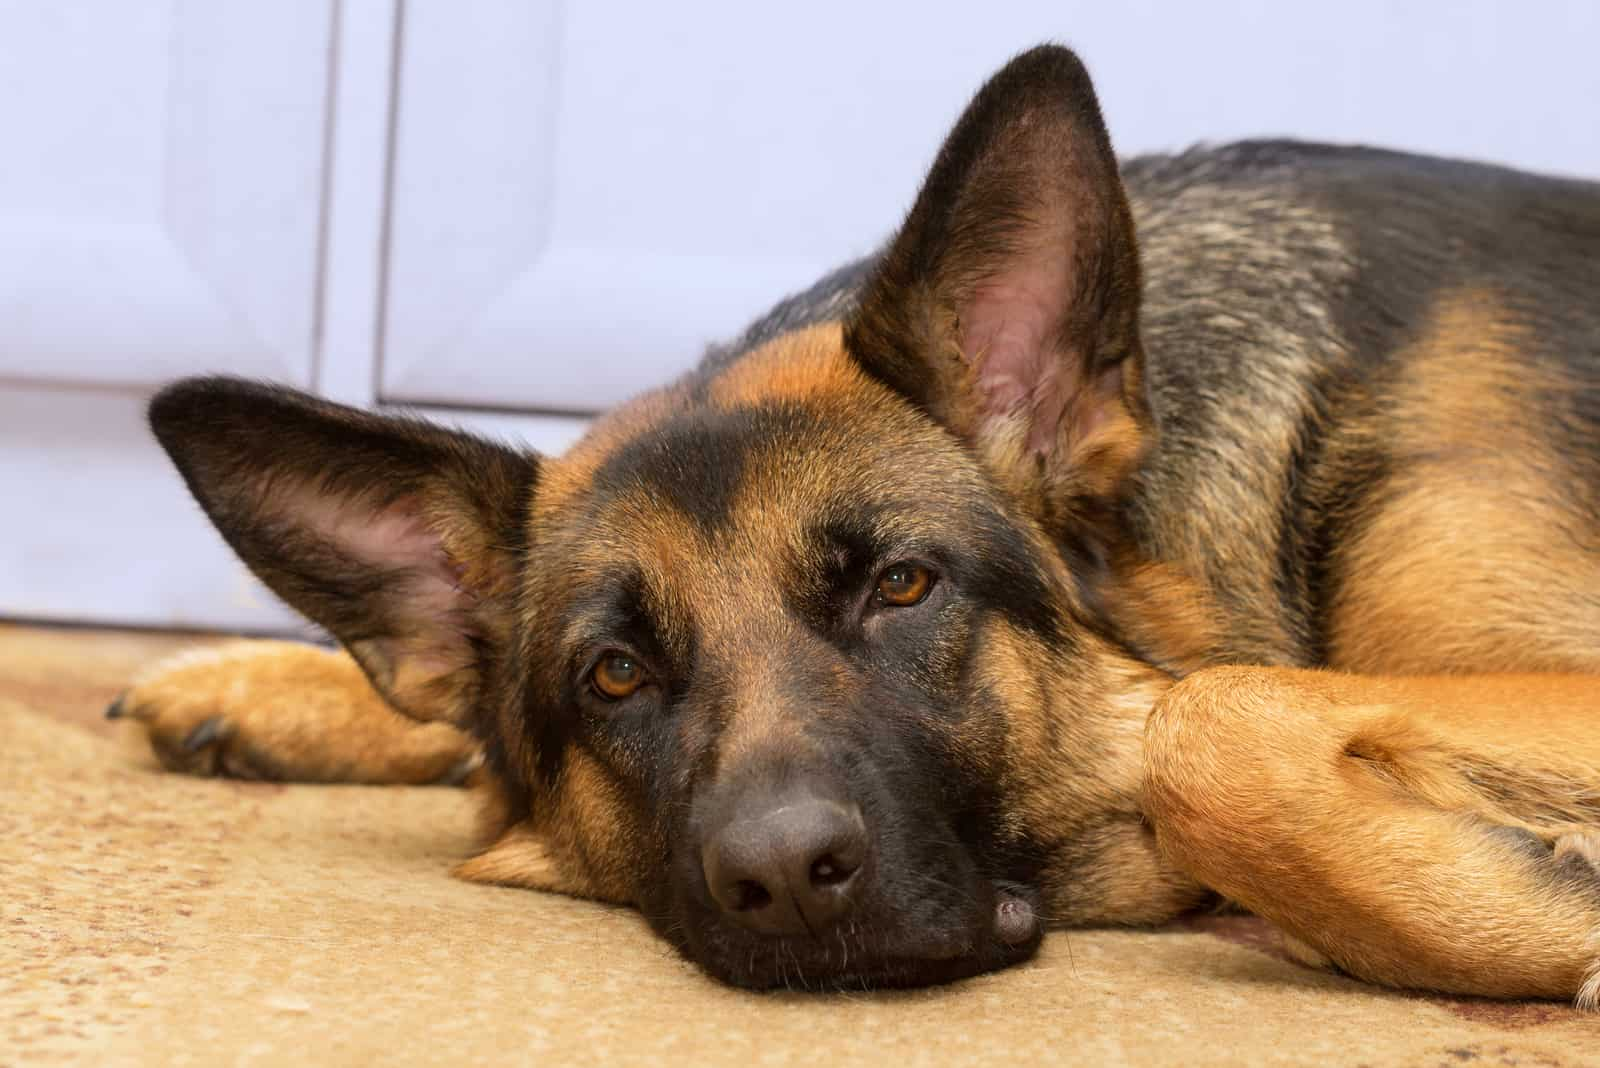 a German Shepherd is lying on the carpet